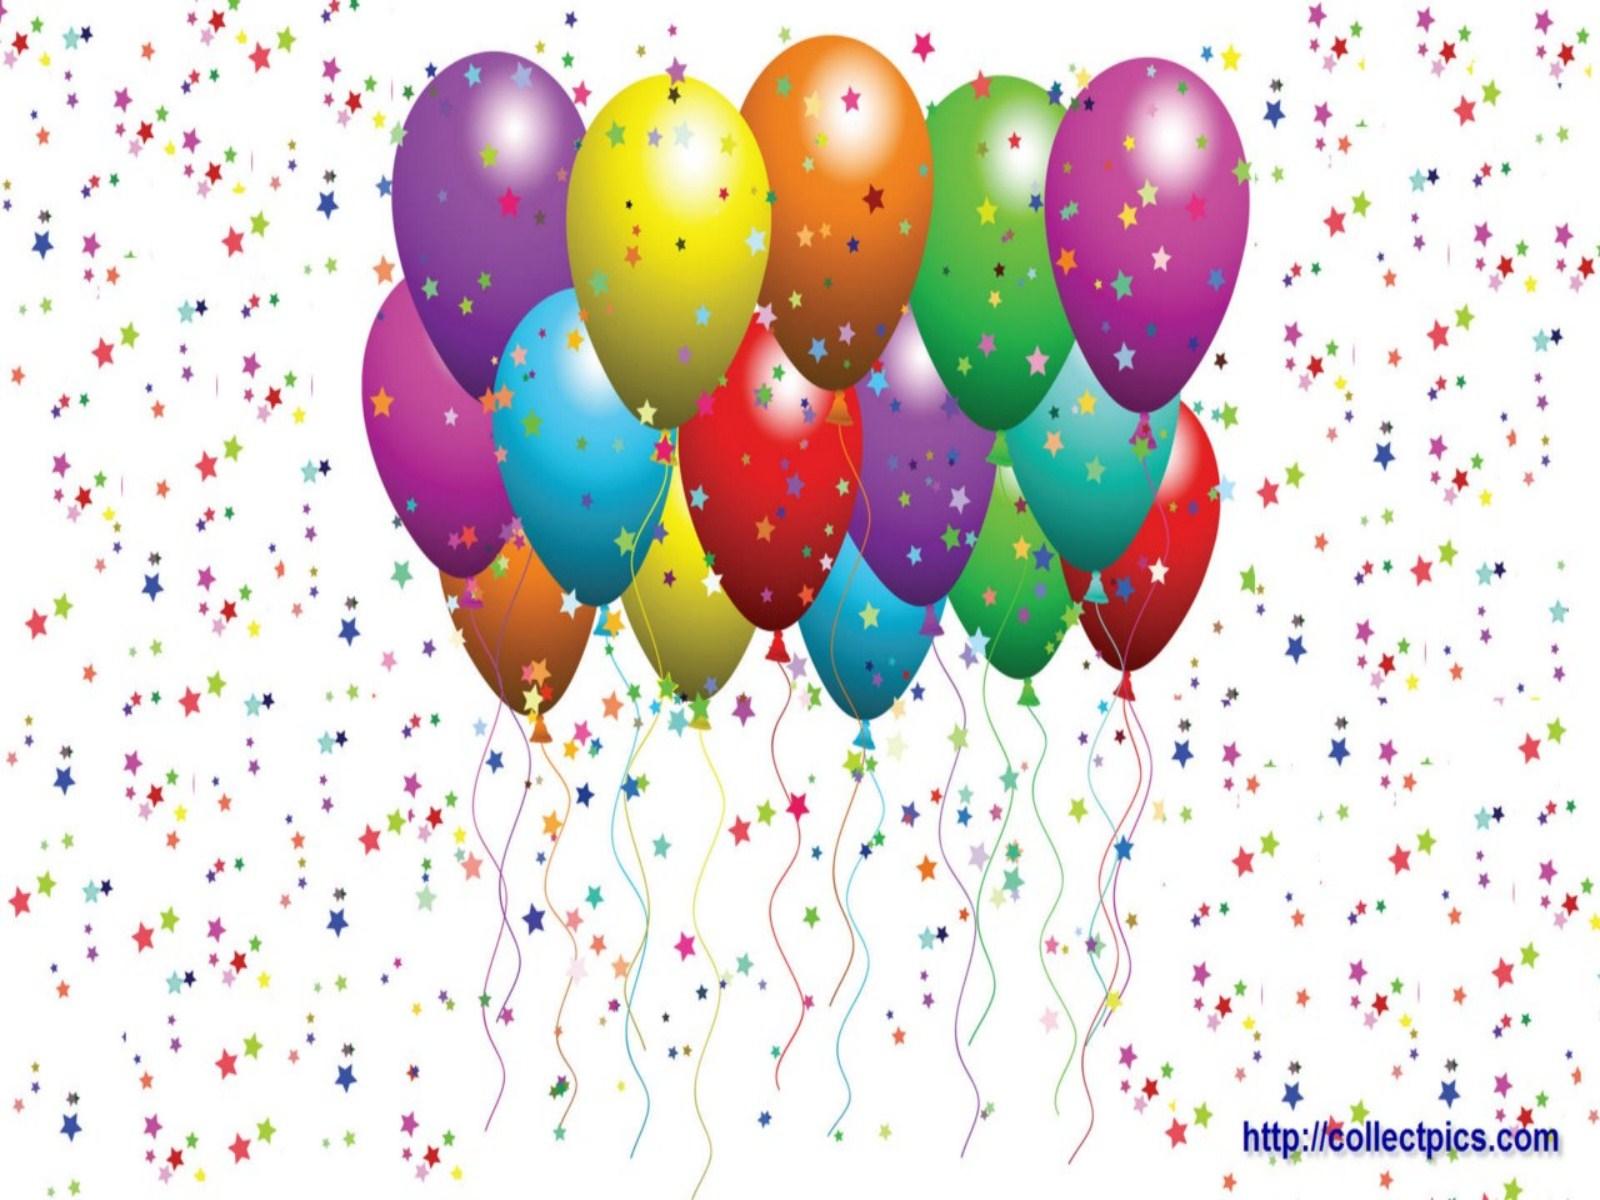 Birthday Balloon Pictures Wallpaper 1600x1200 270764 1600x1200